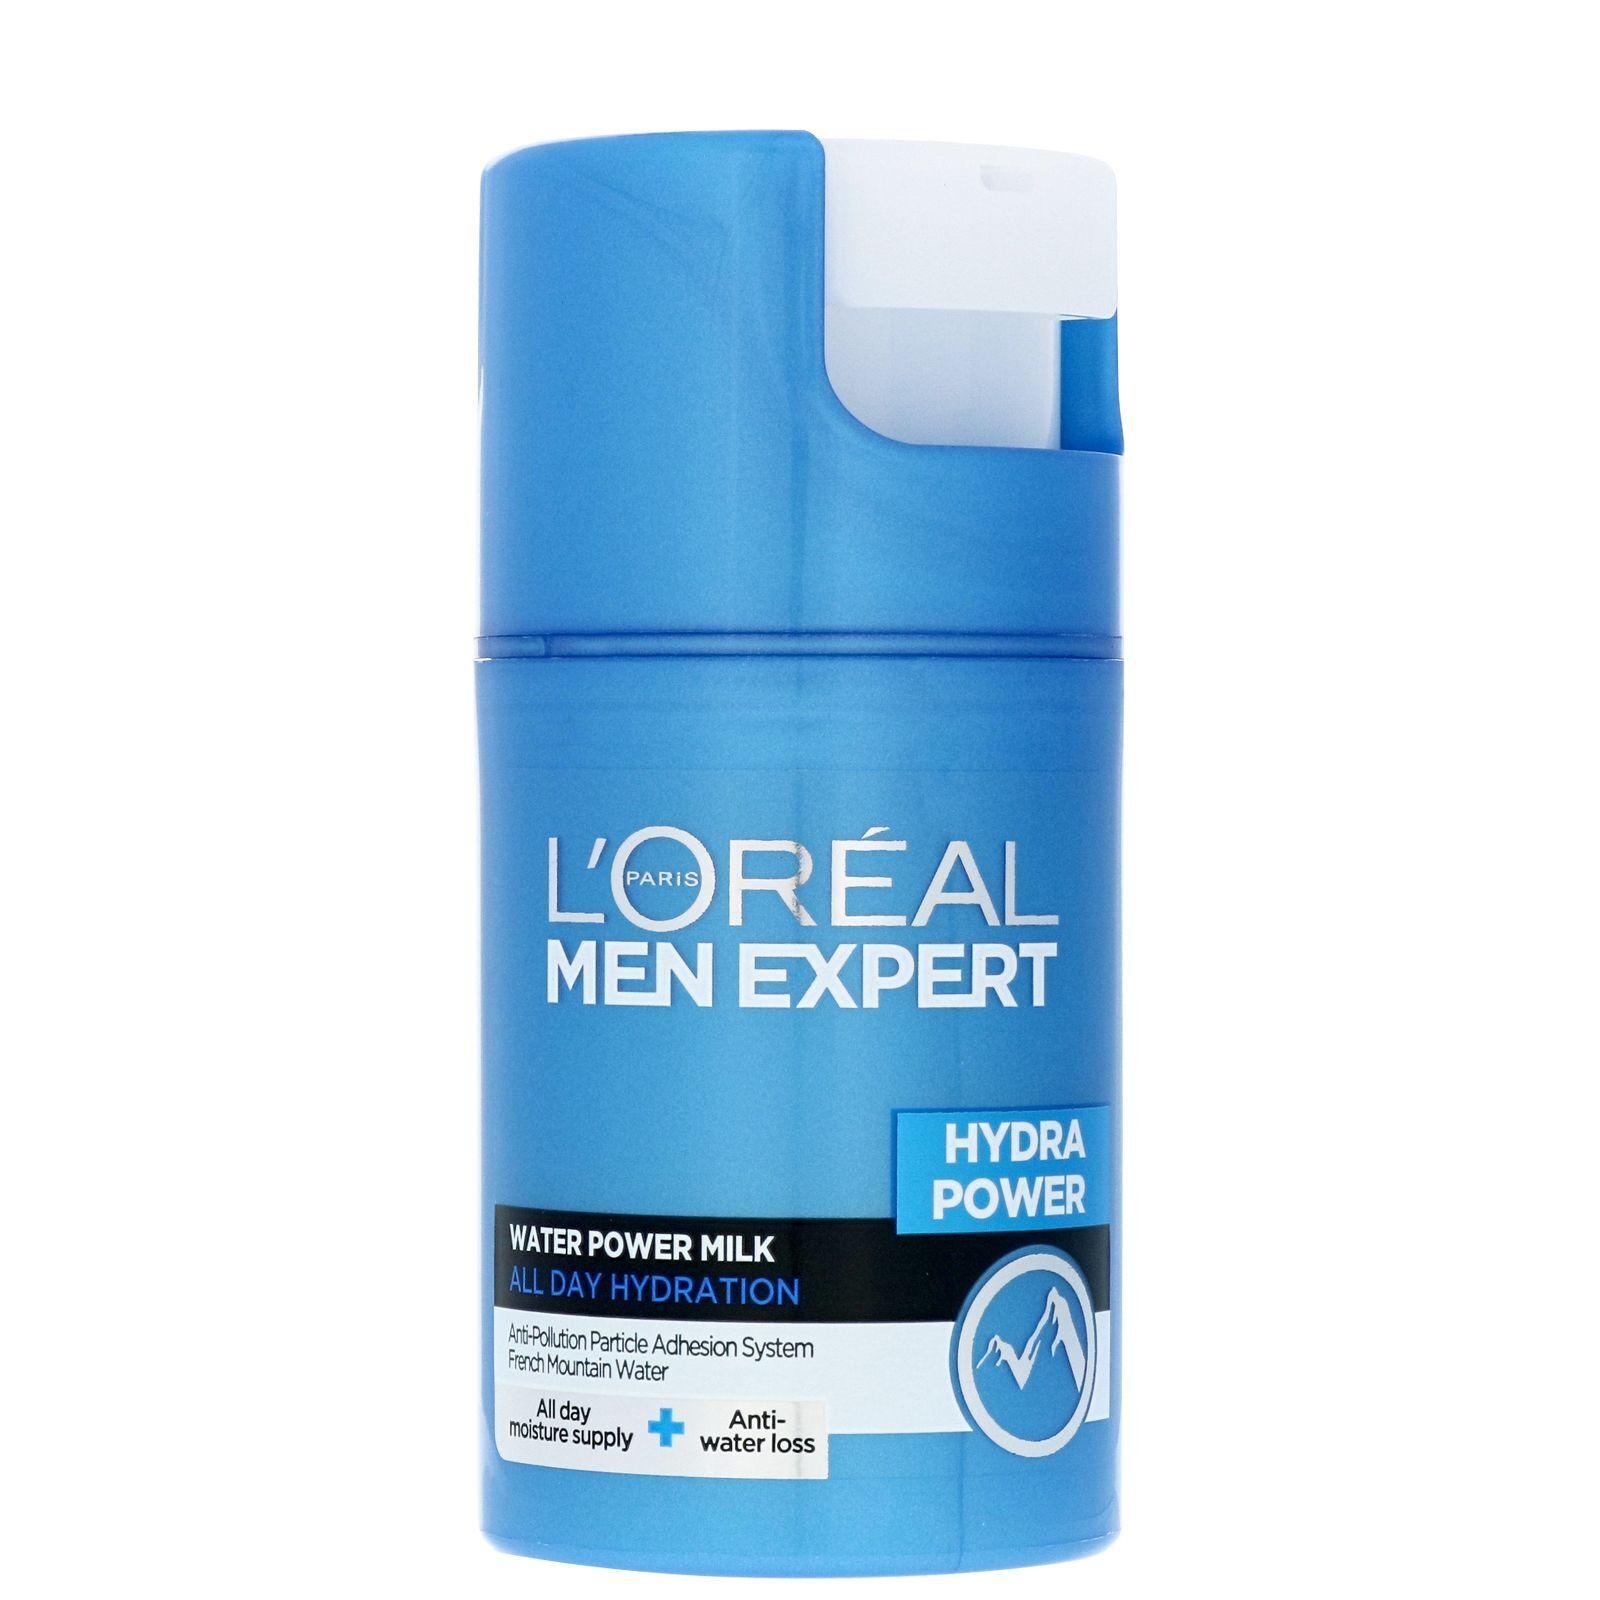 L'Oréal Paris - Men Expert Hydra Power: Water Power Milk All Day Hydration 50ml